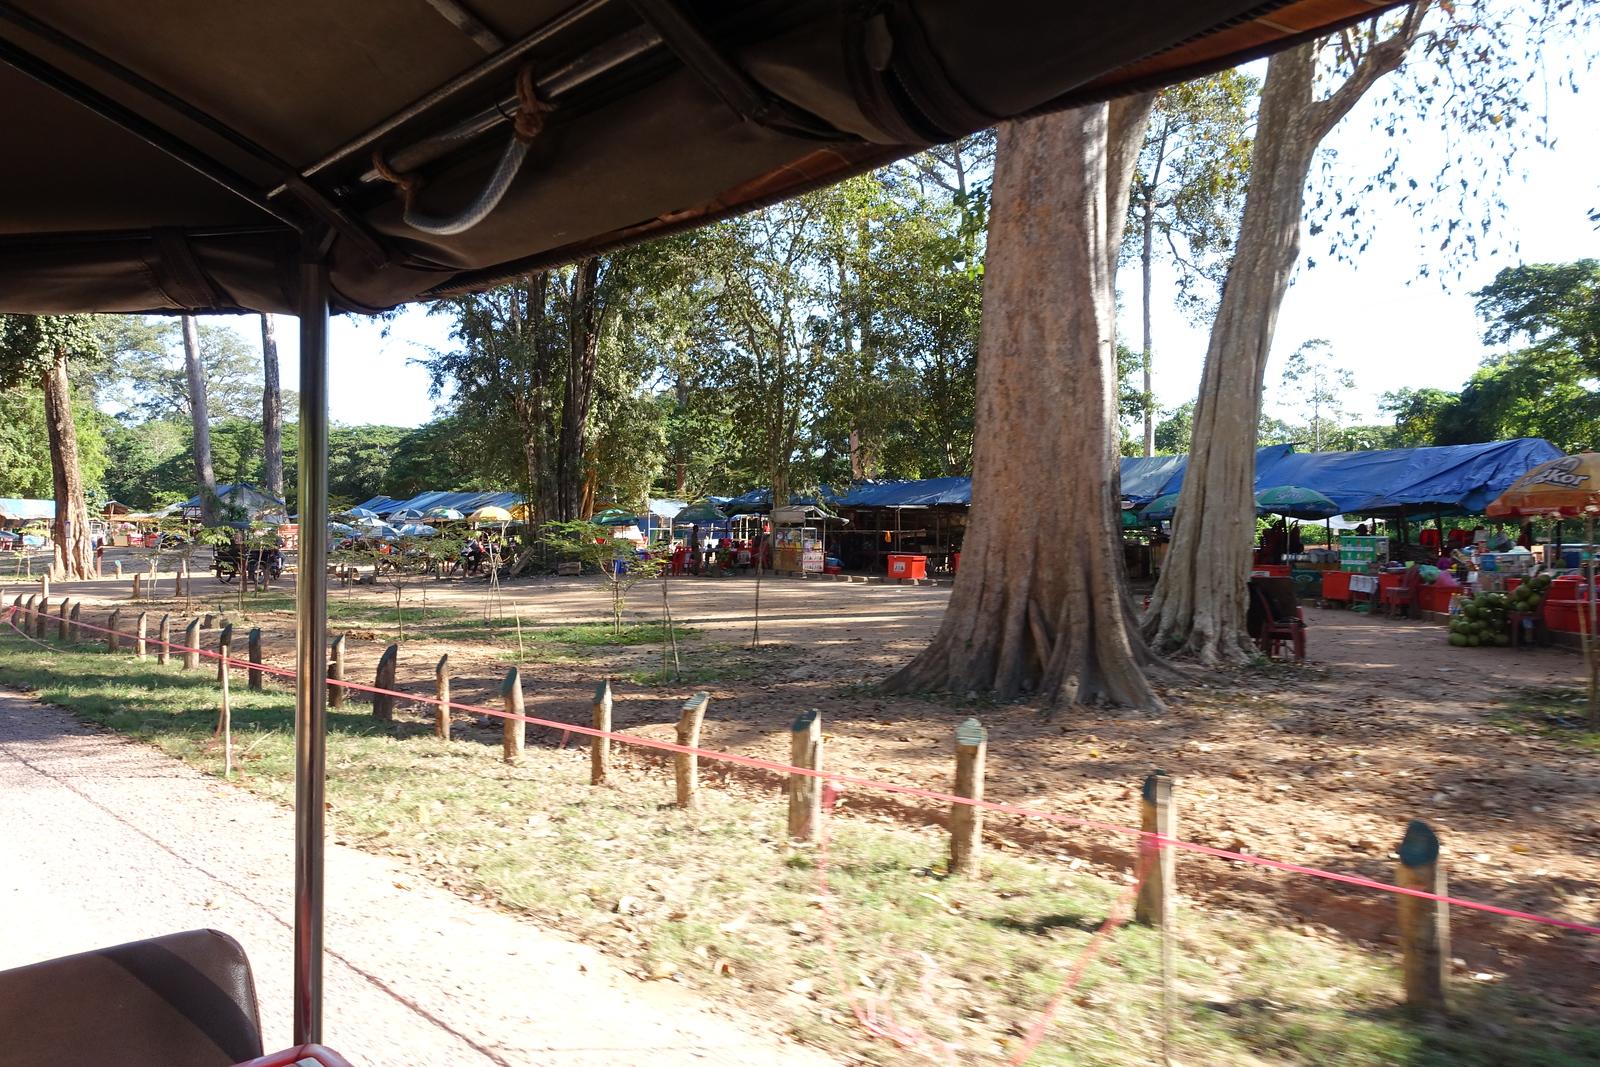 Siem Reap – Morning Life on a Tuk Tuk